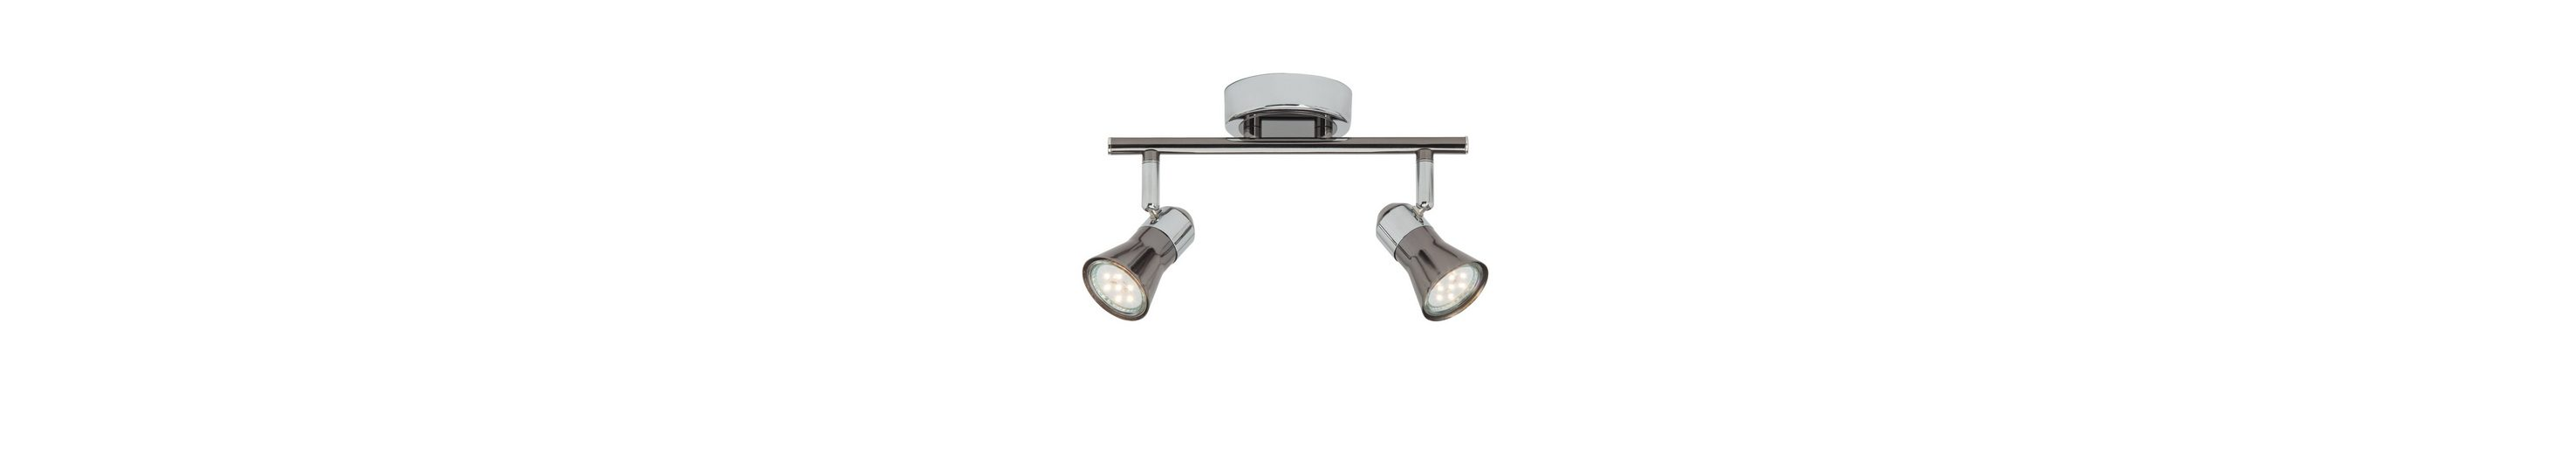 Brilliant Leuchten Jupp LED Spotrohr, 2-flammig chrom/schwarz